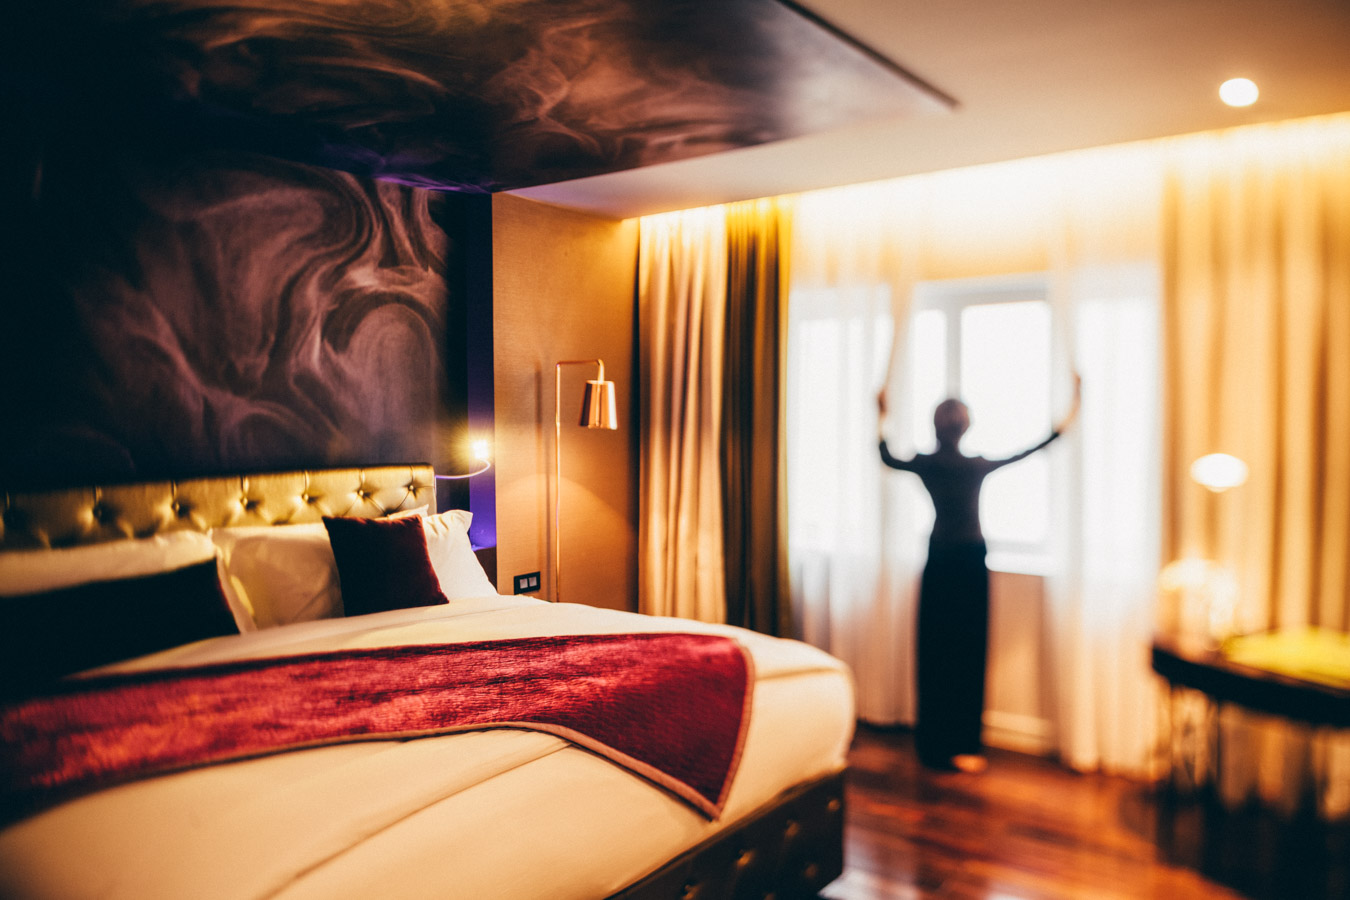 Luxury-Resort-Photographer-02-1.jpg